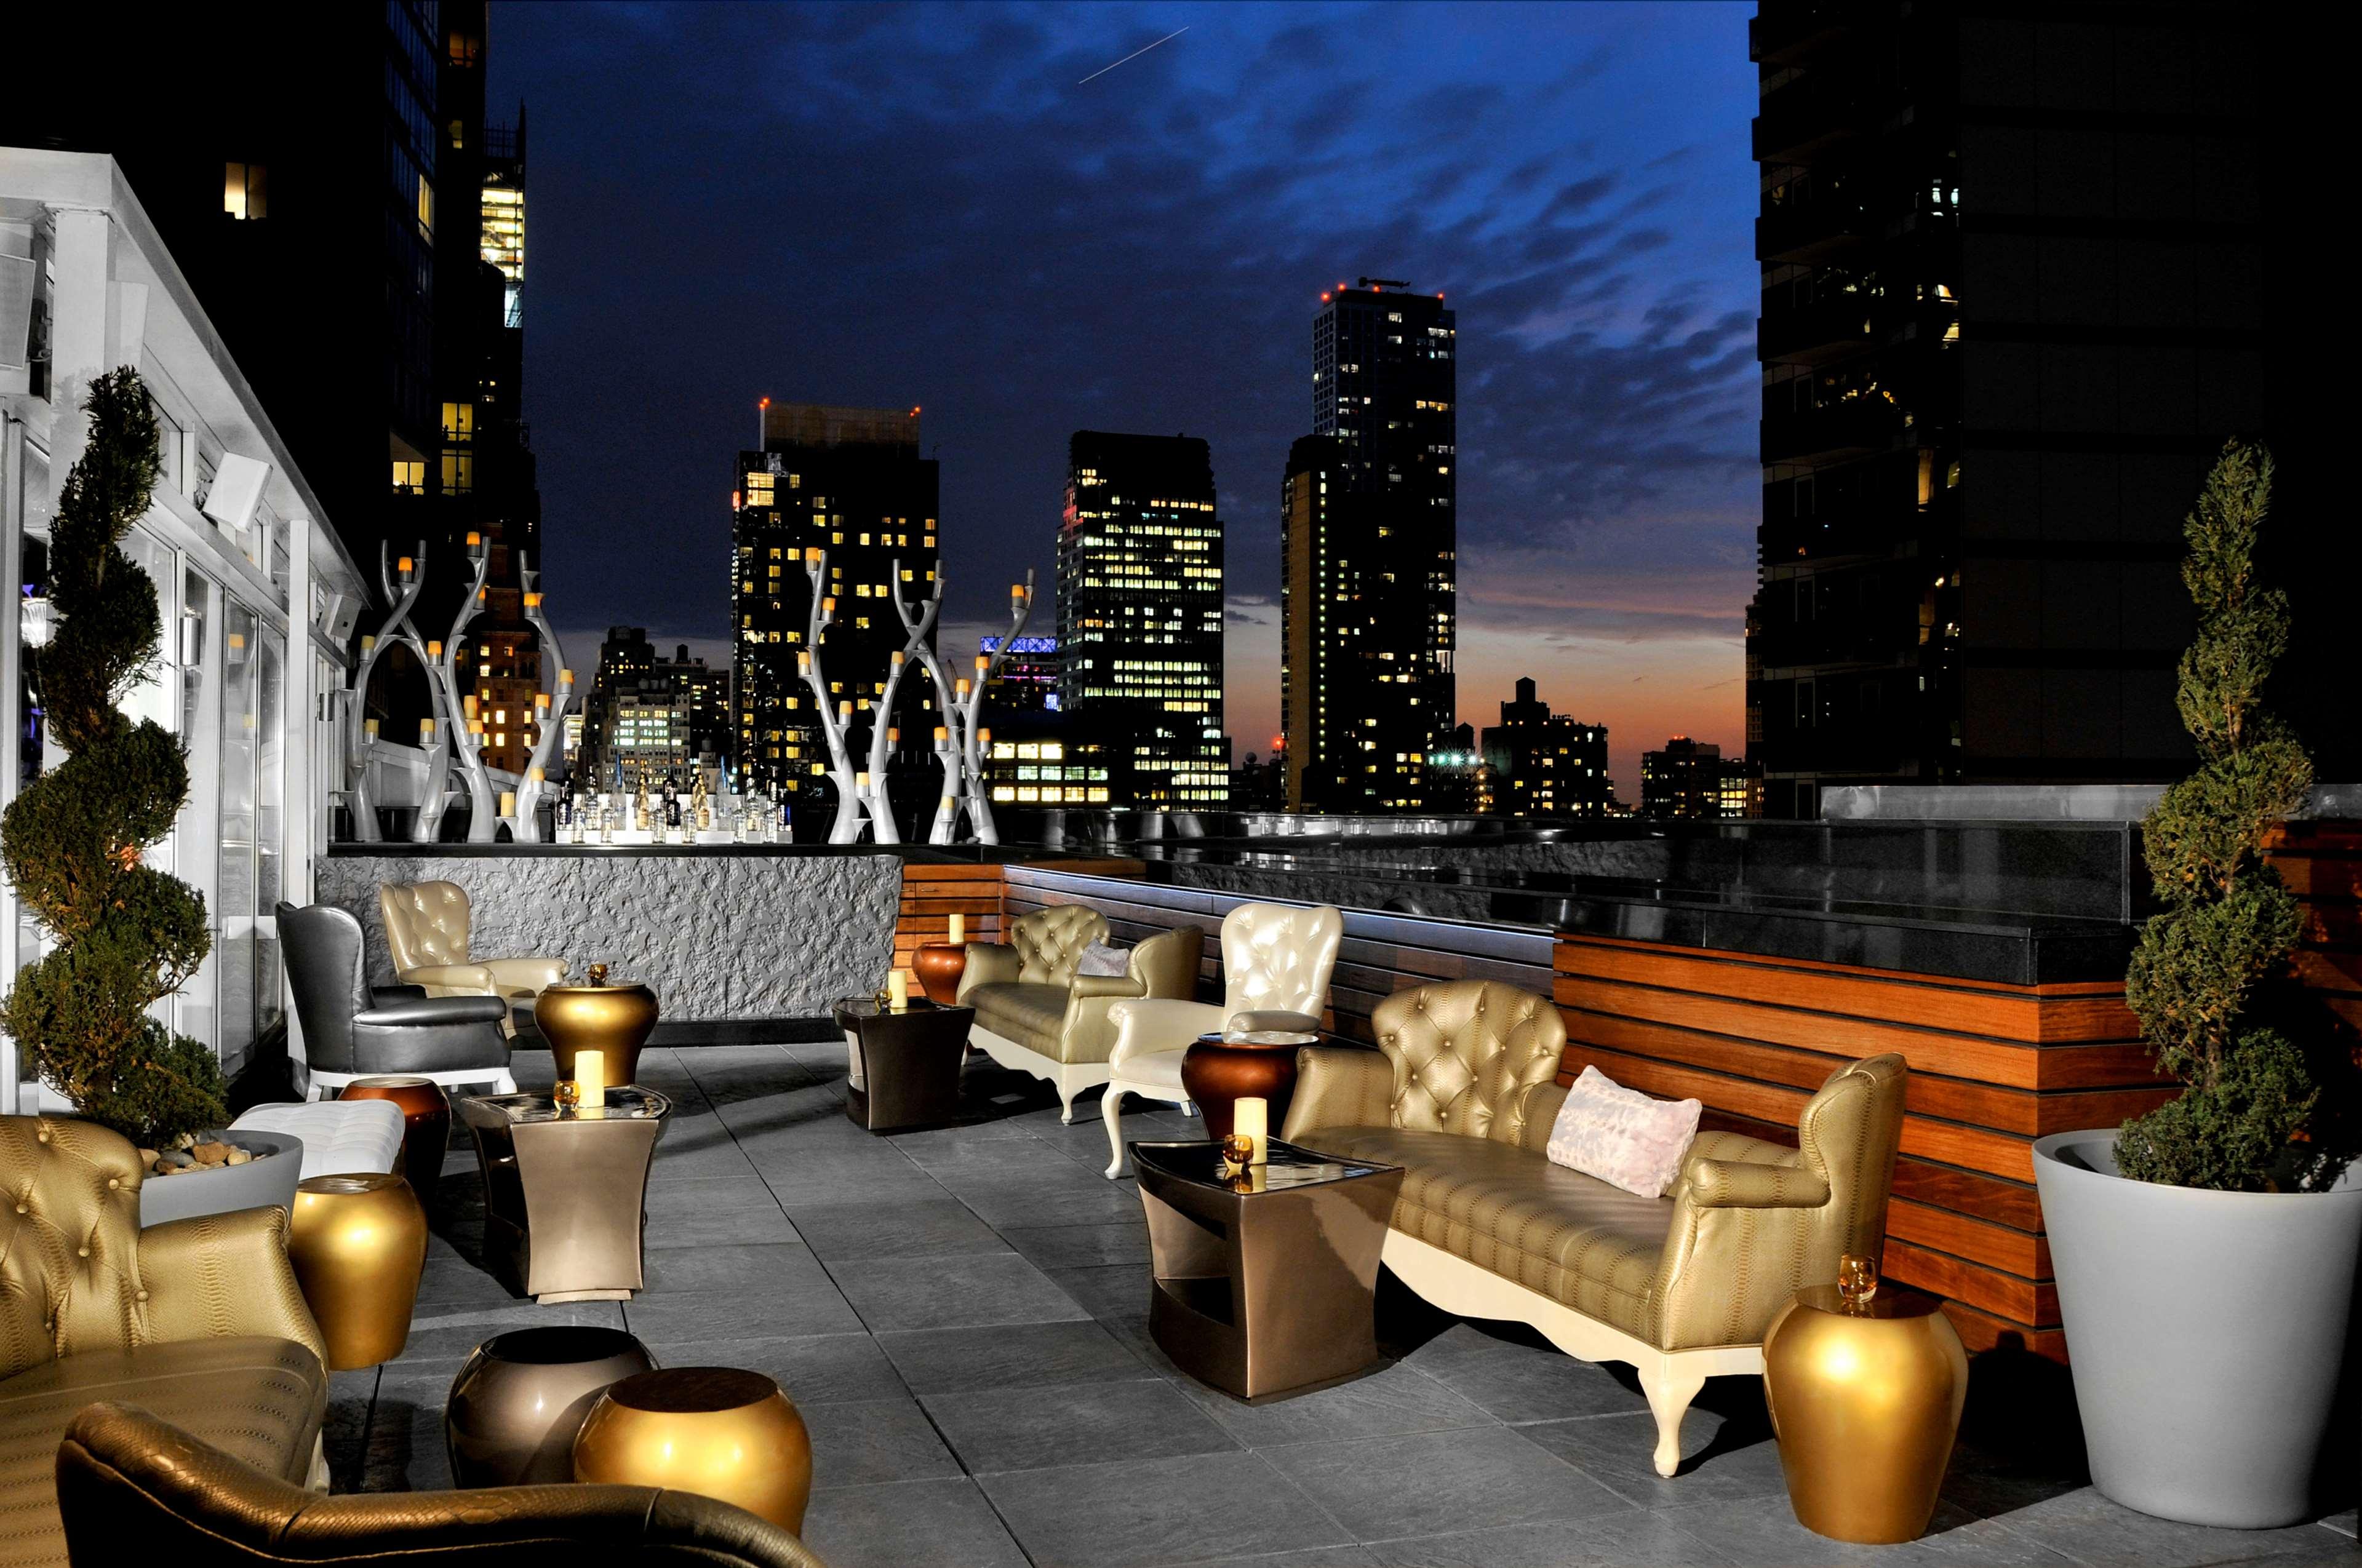 Hilton Garden Inn Times Square image 21